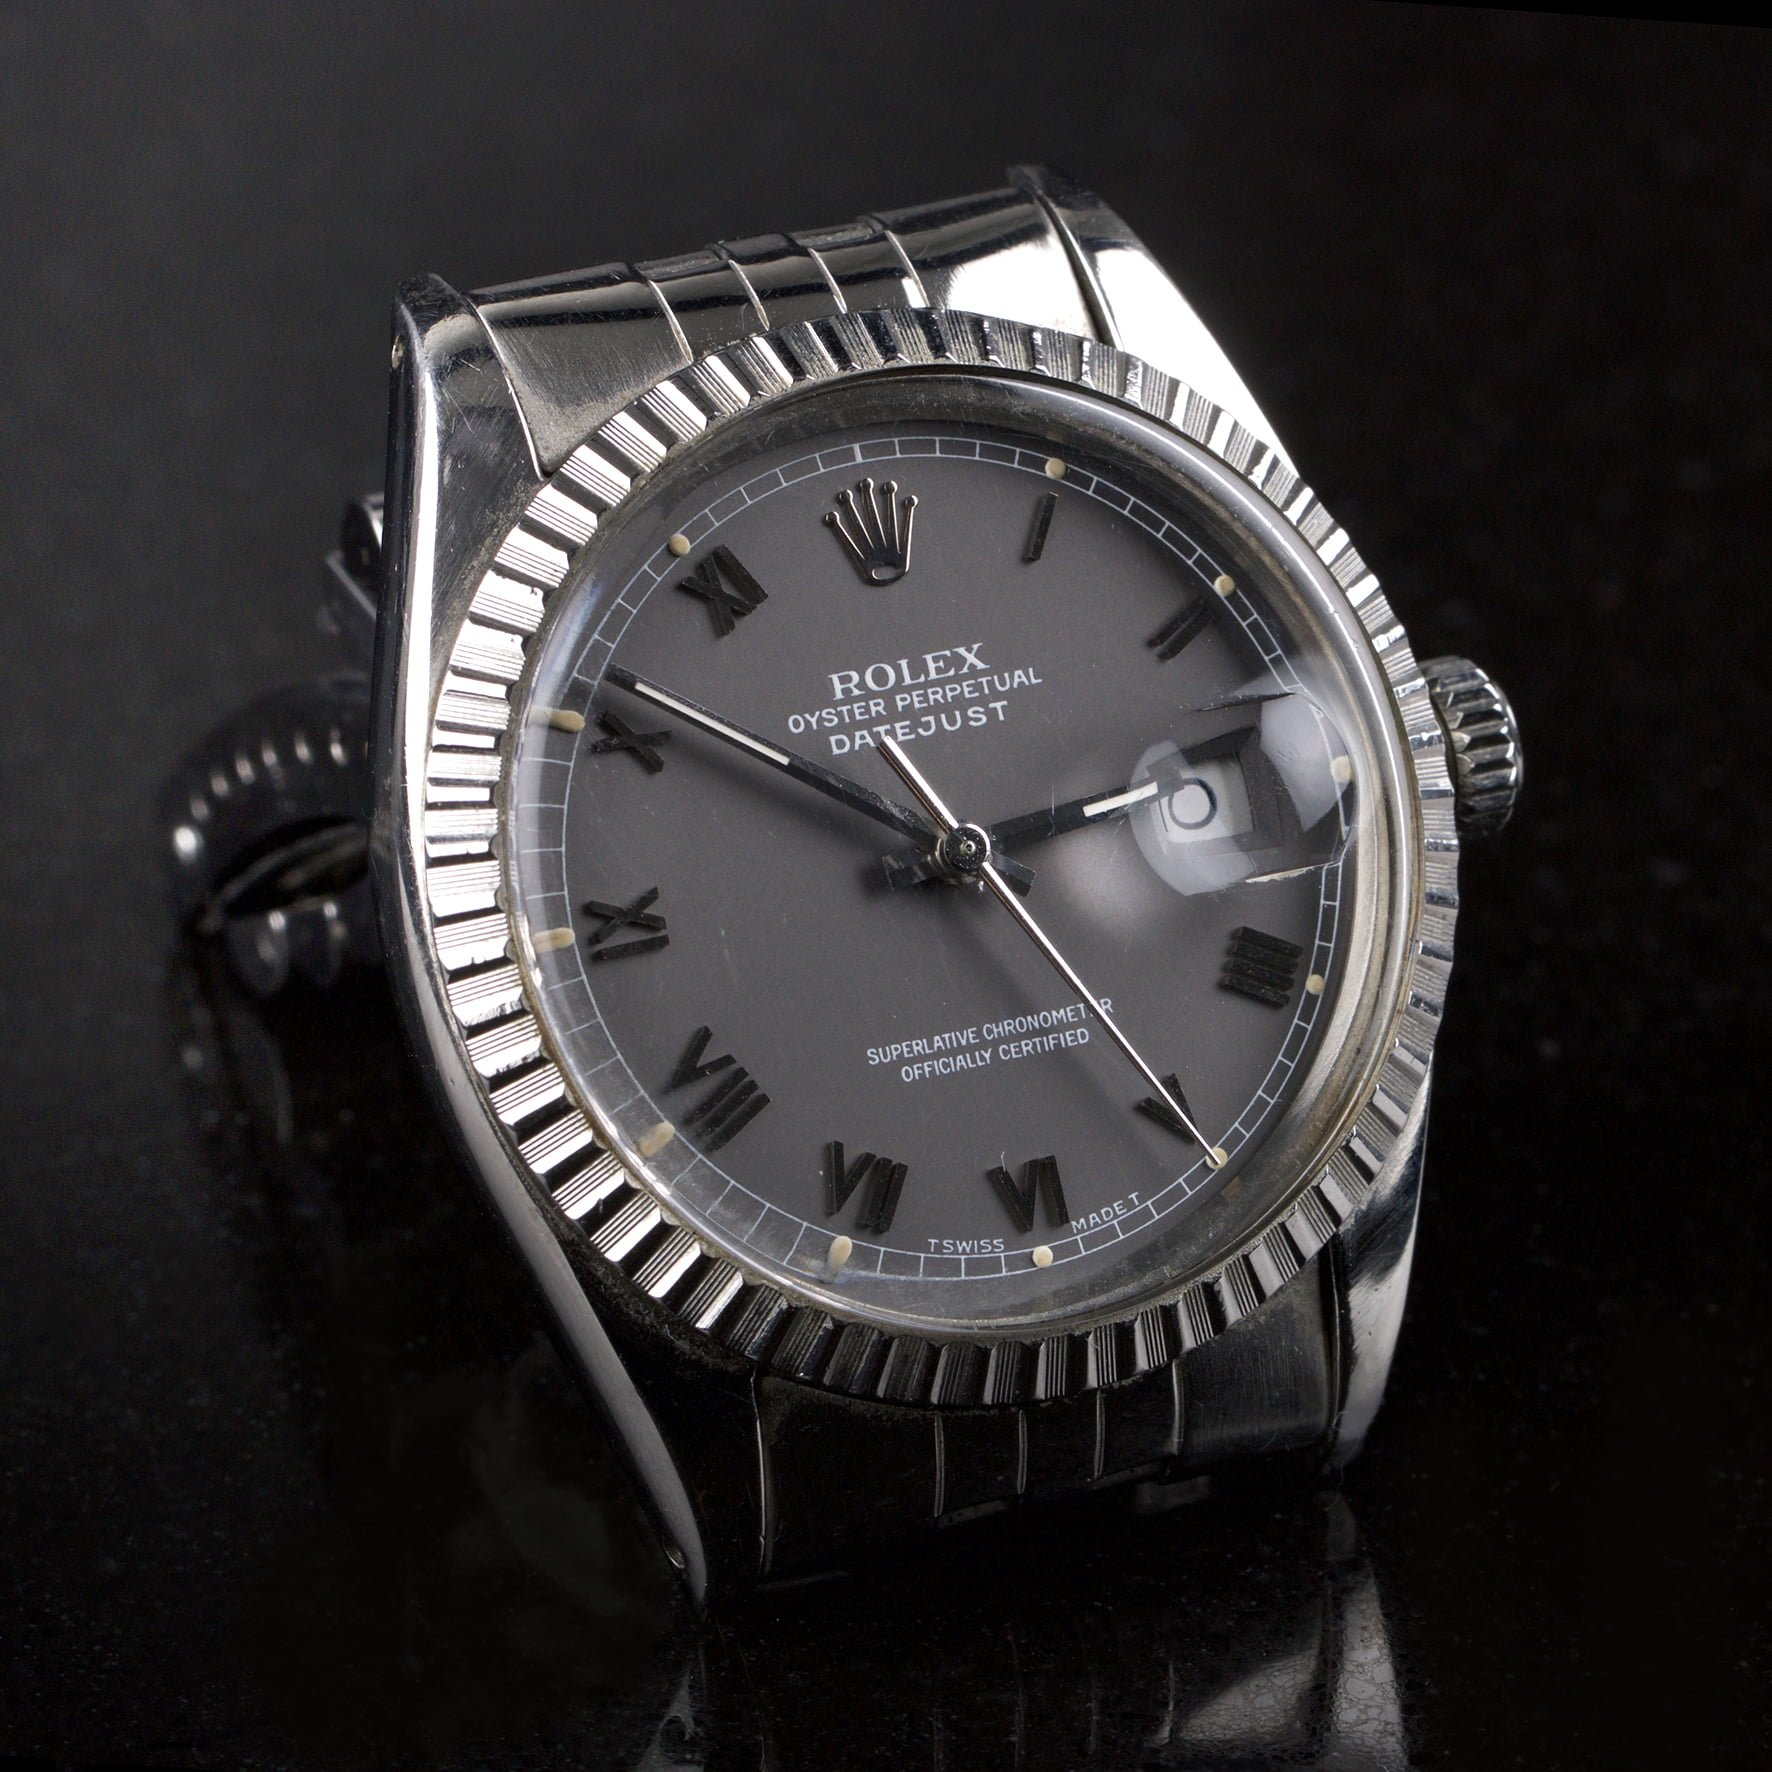 73683ebd76a1 SOLD! Vintage Rolex Datejust ref 16030 Plexi - Classic390